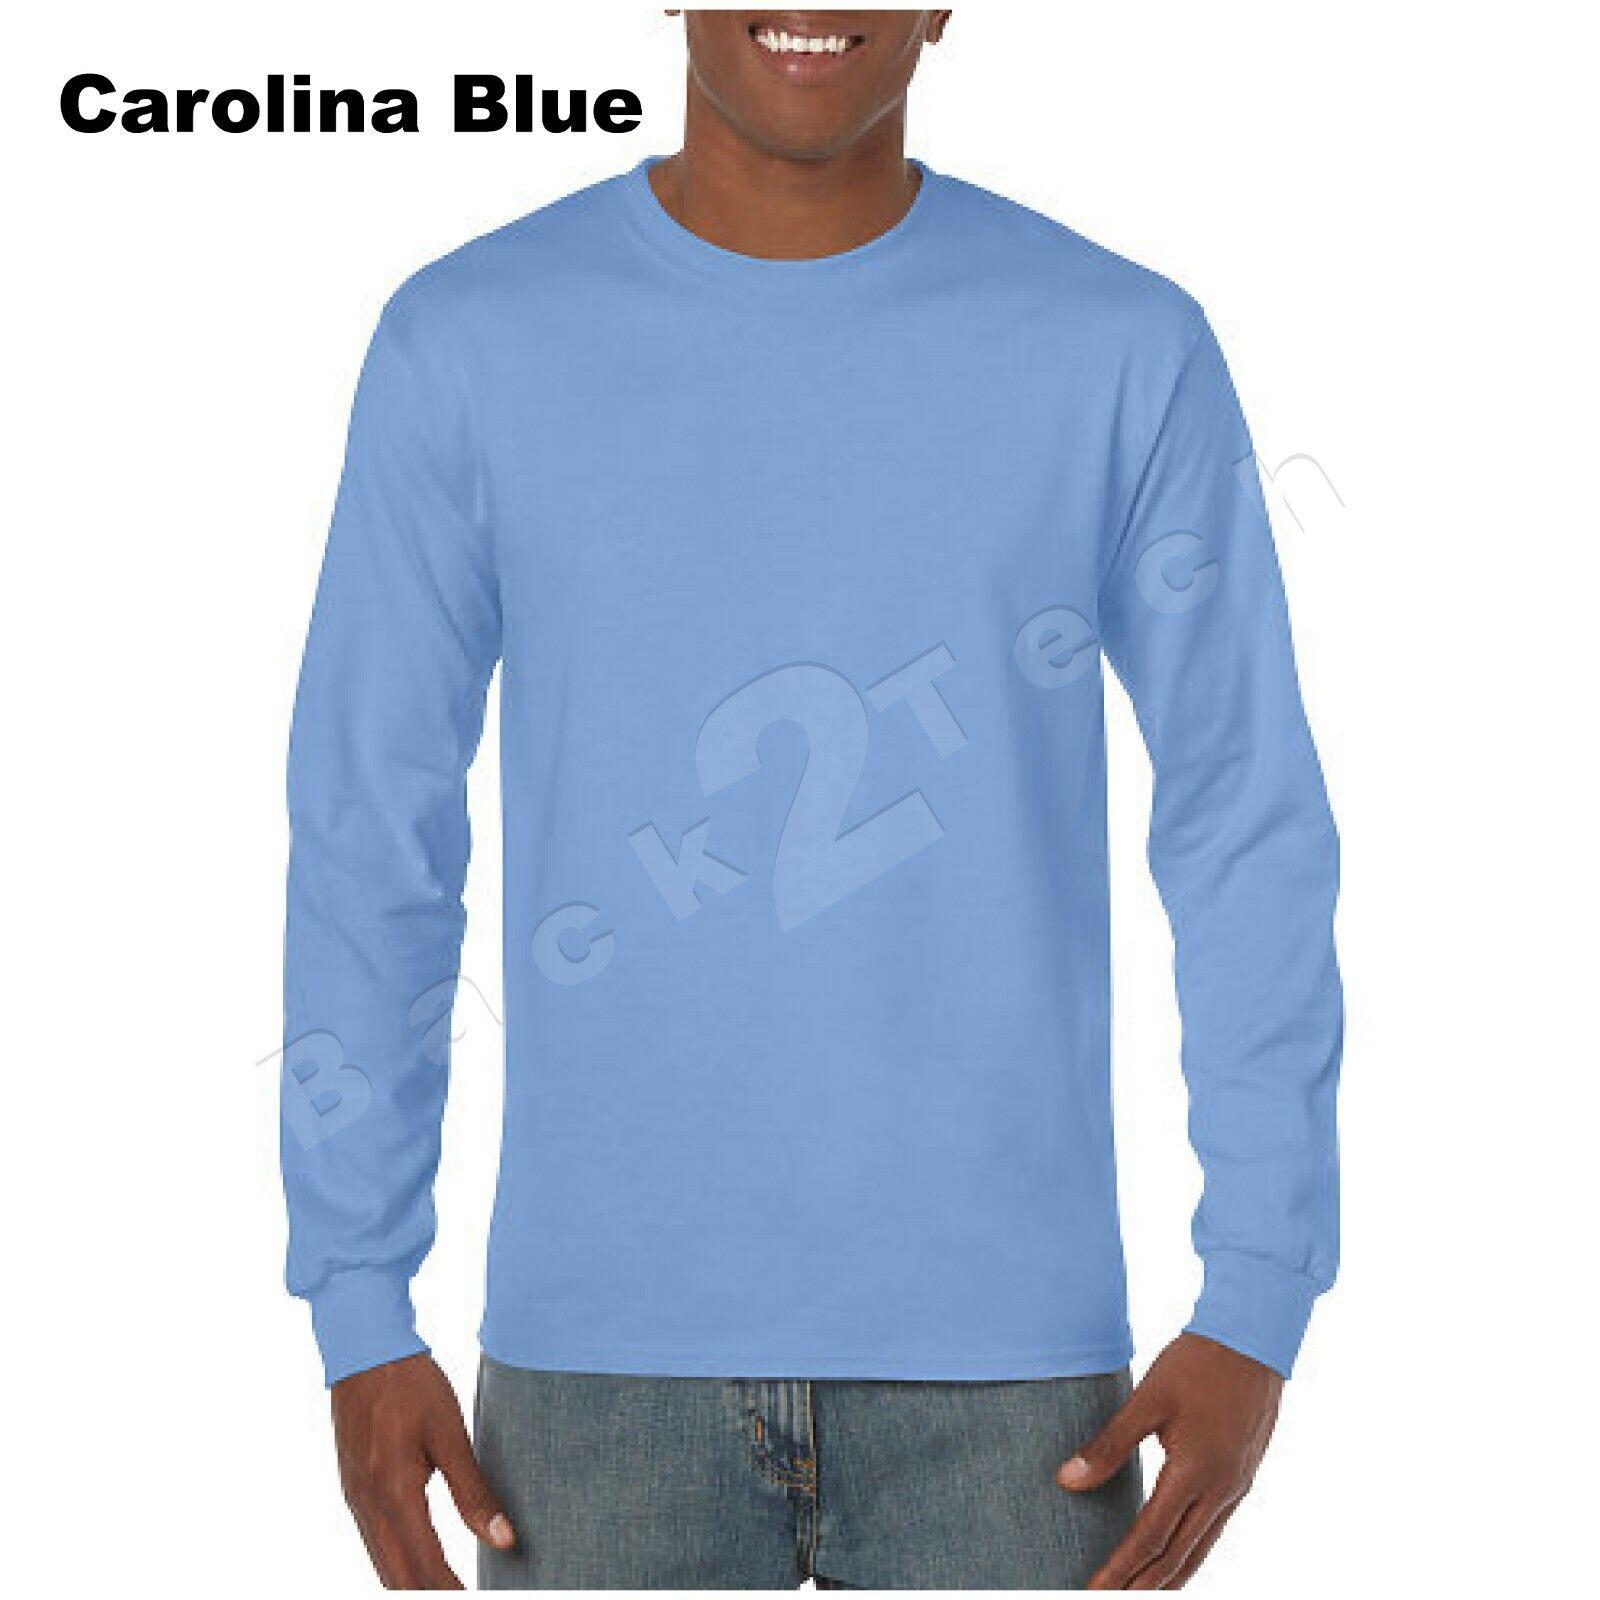 CarolinaBlue